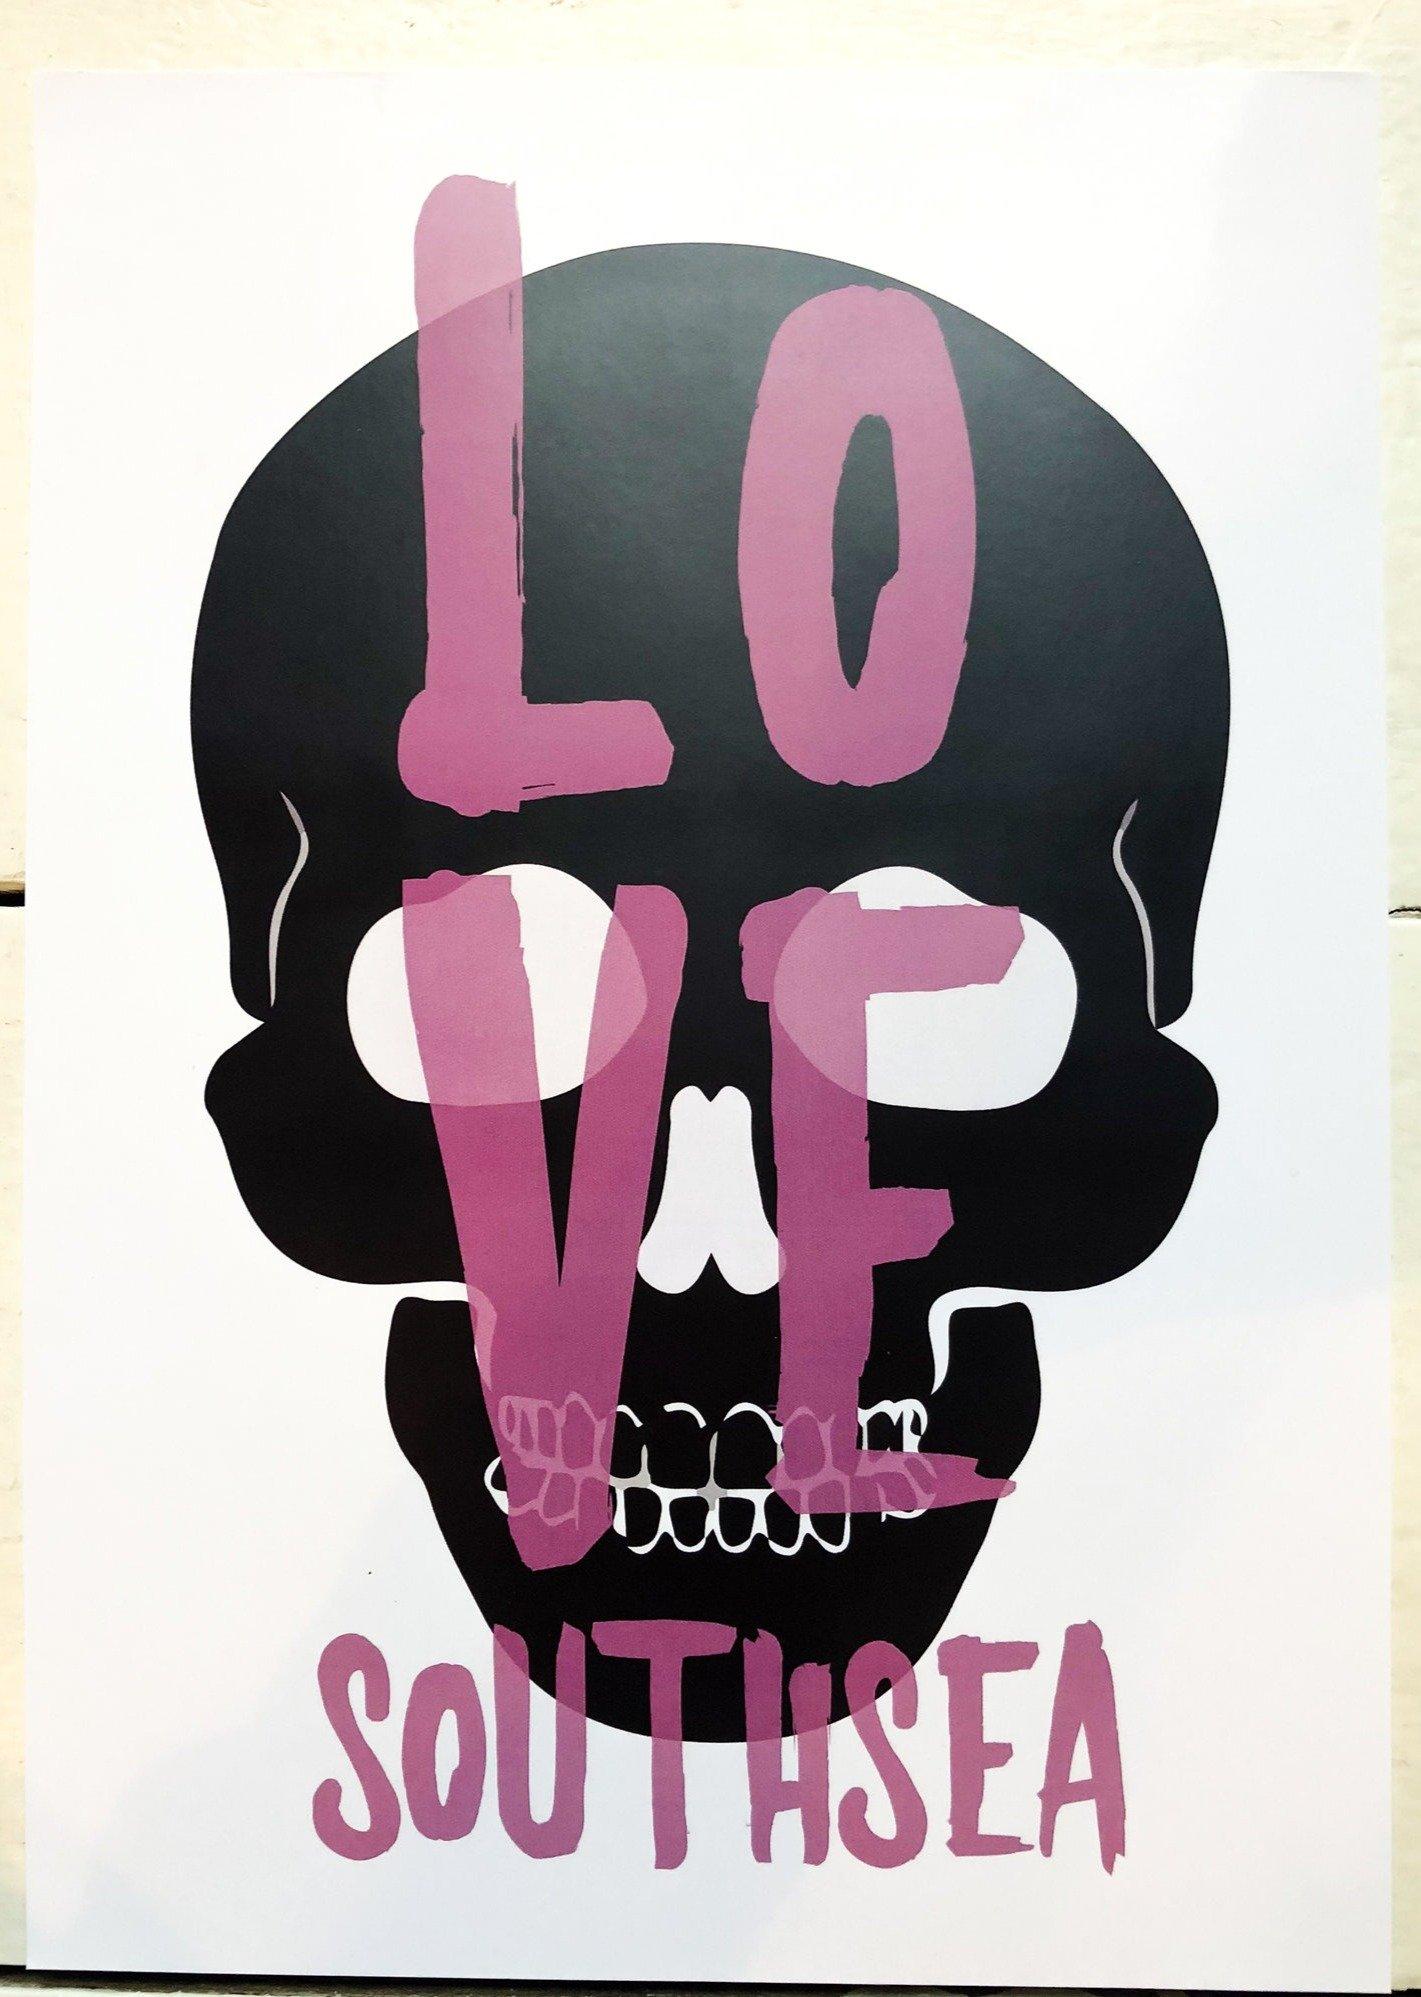 Love Southsea Skull Print A3